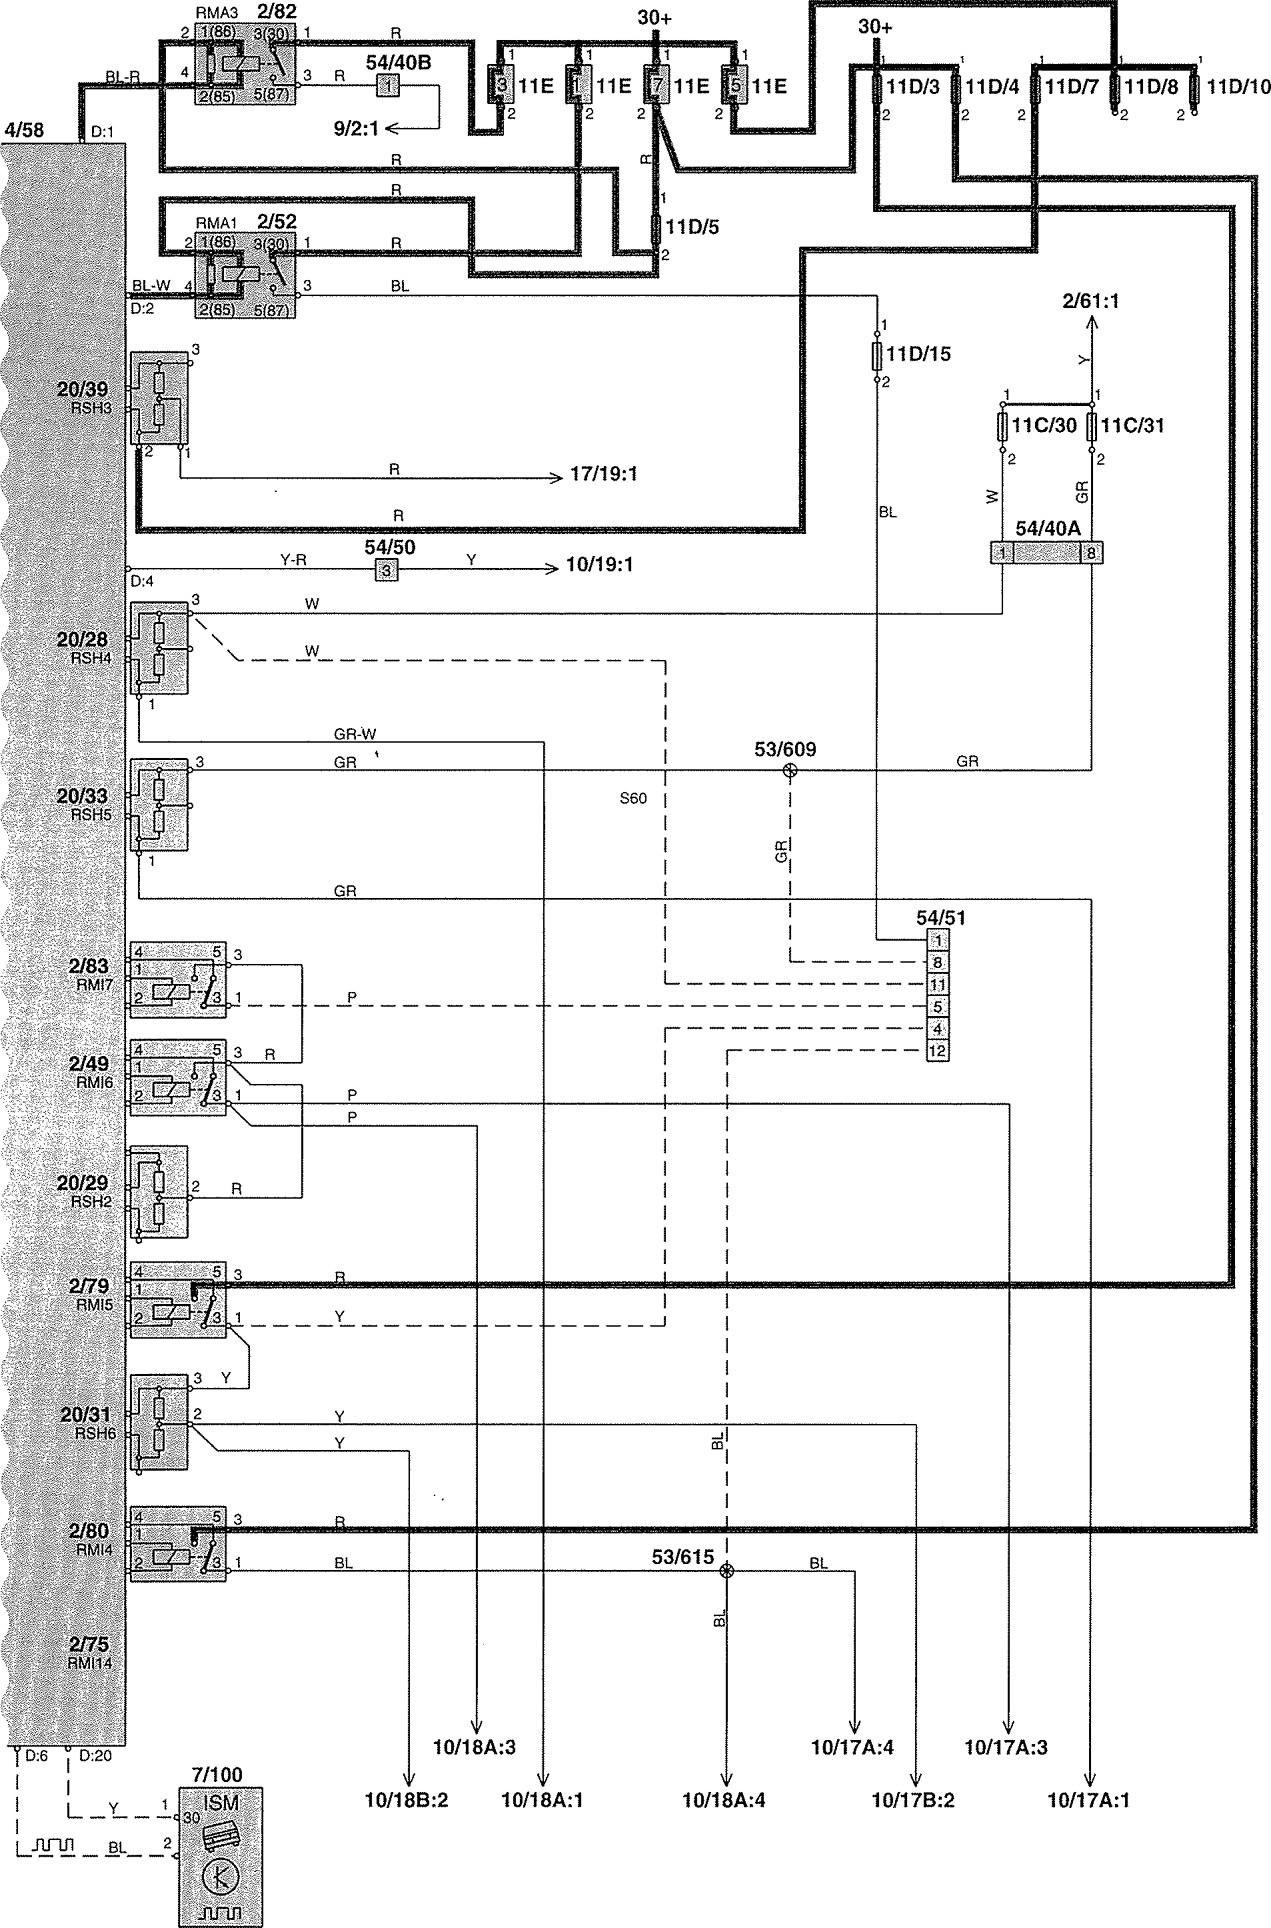 2005 volvo xc70 wiring diagram volvo xc90 stereo wiring diagram wiring library  volvo xc90 stereo wiring diagram